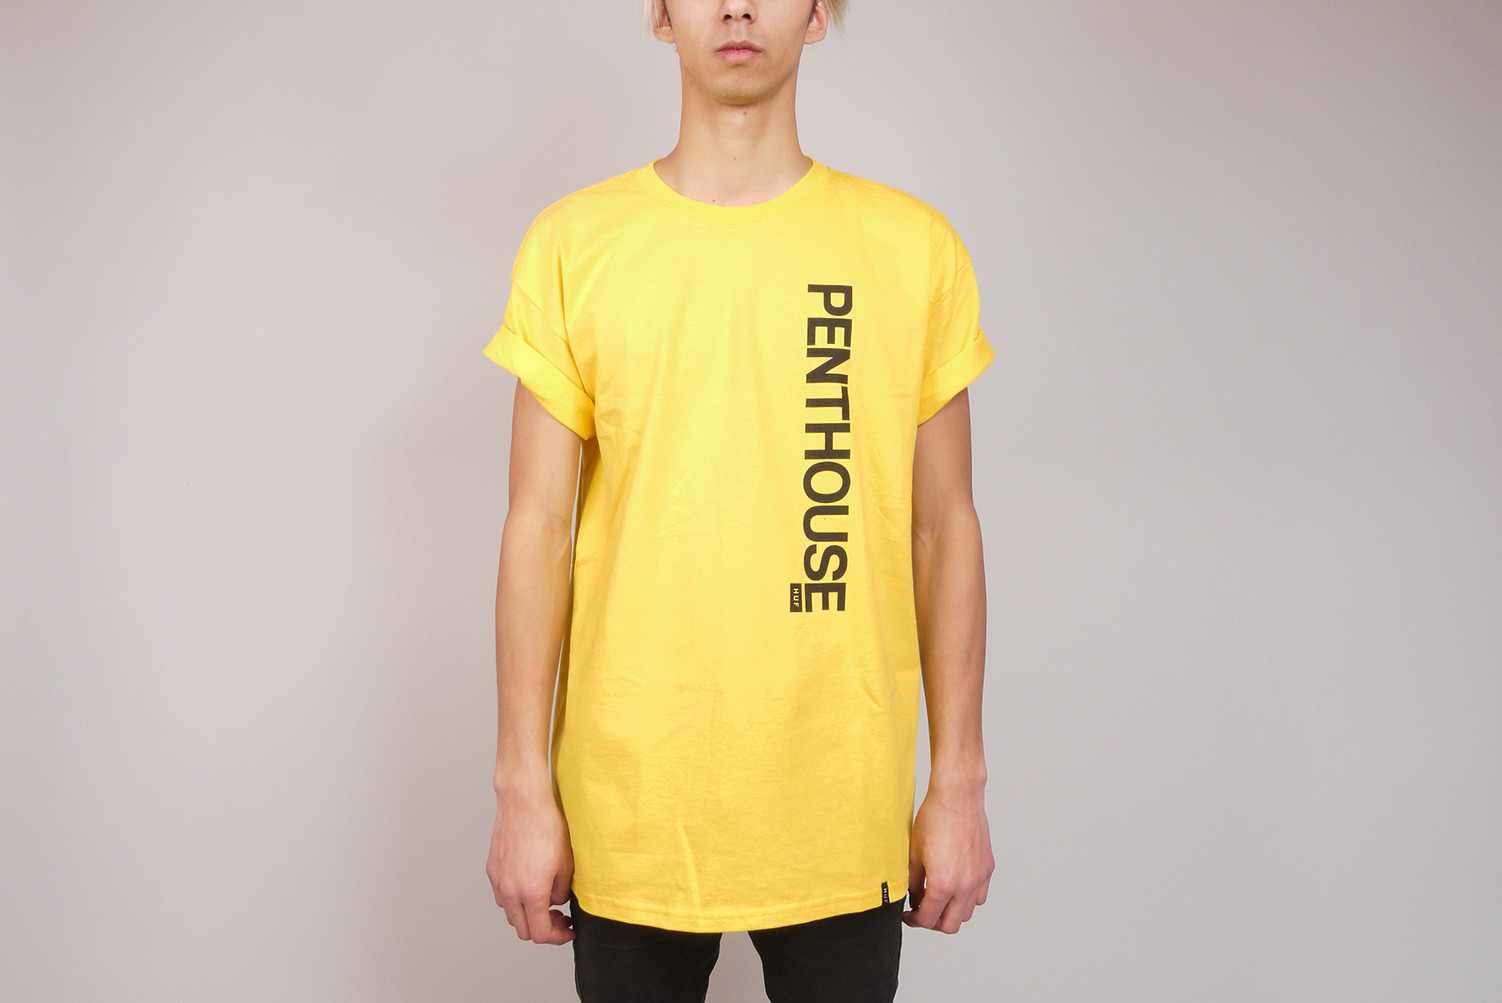 Home; Huf x Penthouse Rose T-Shirt